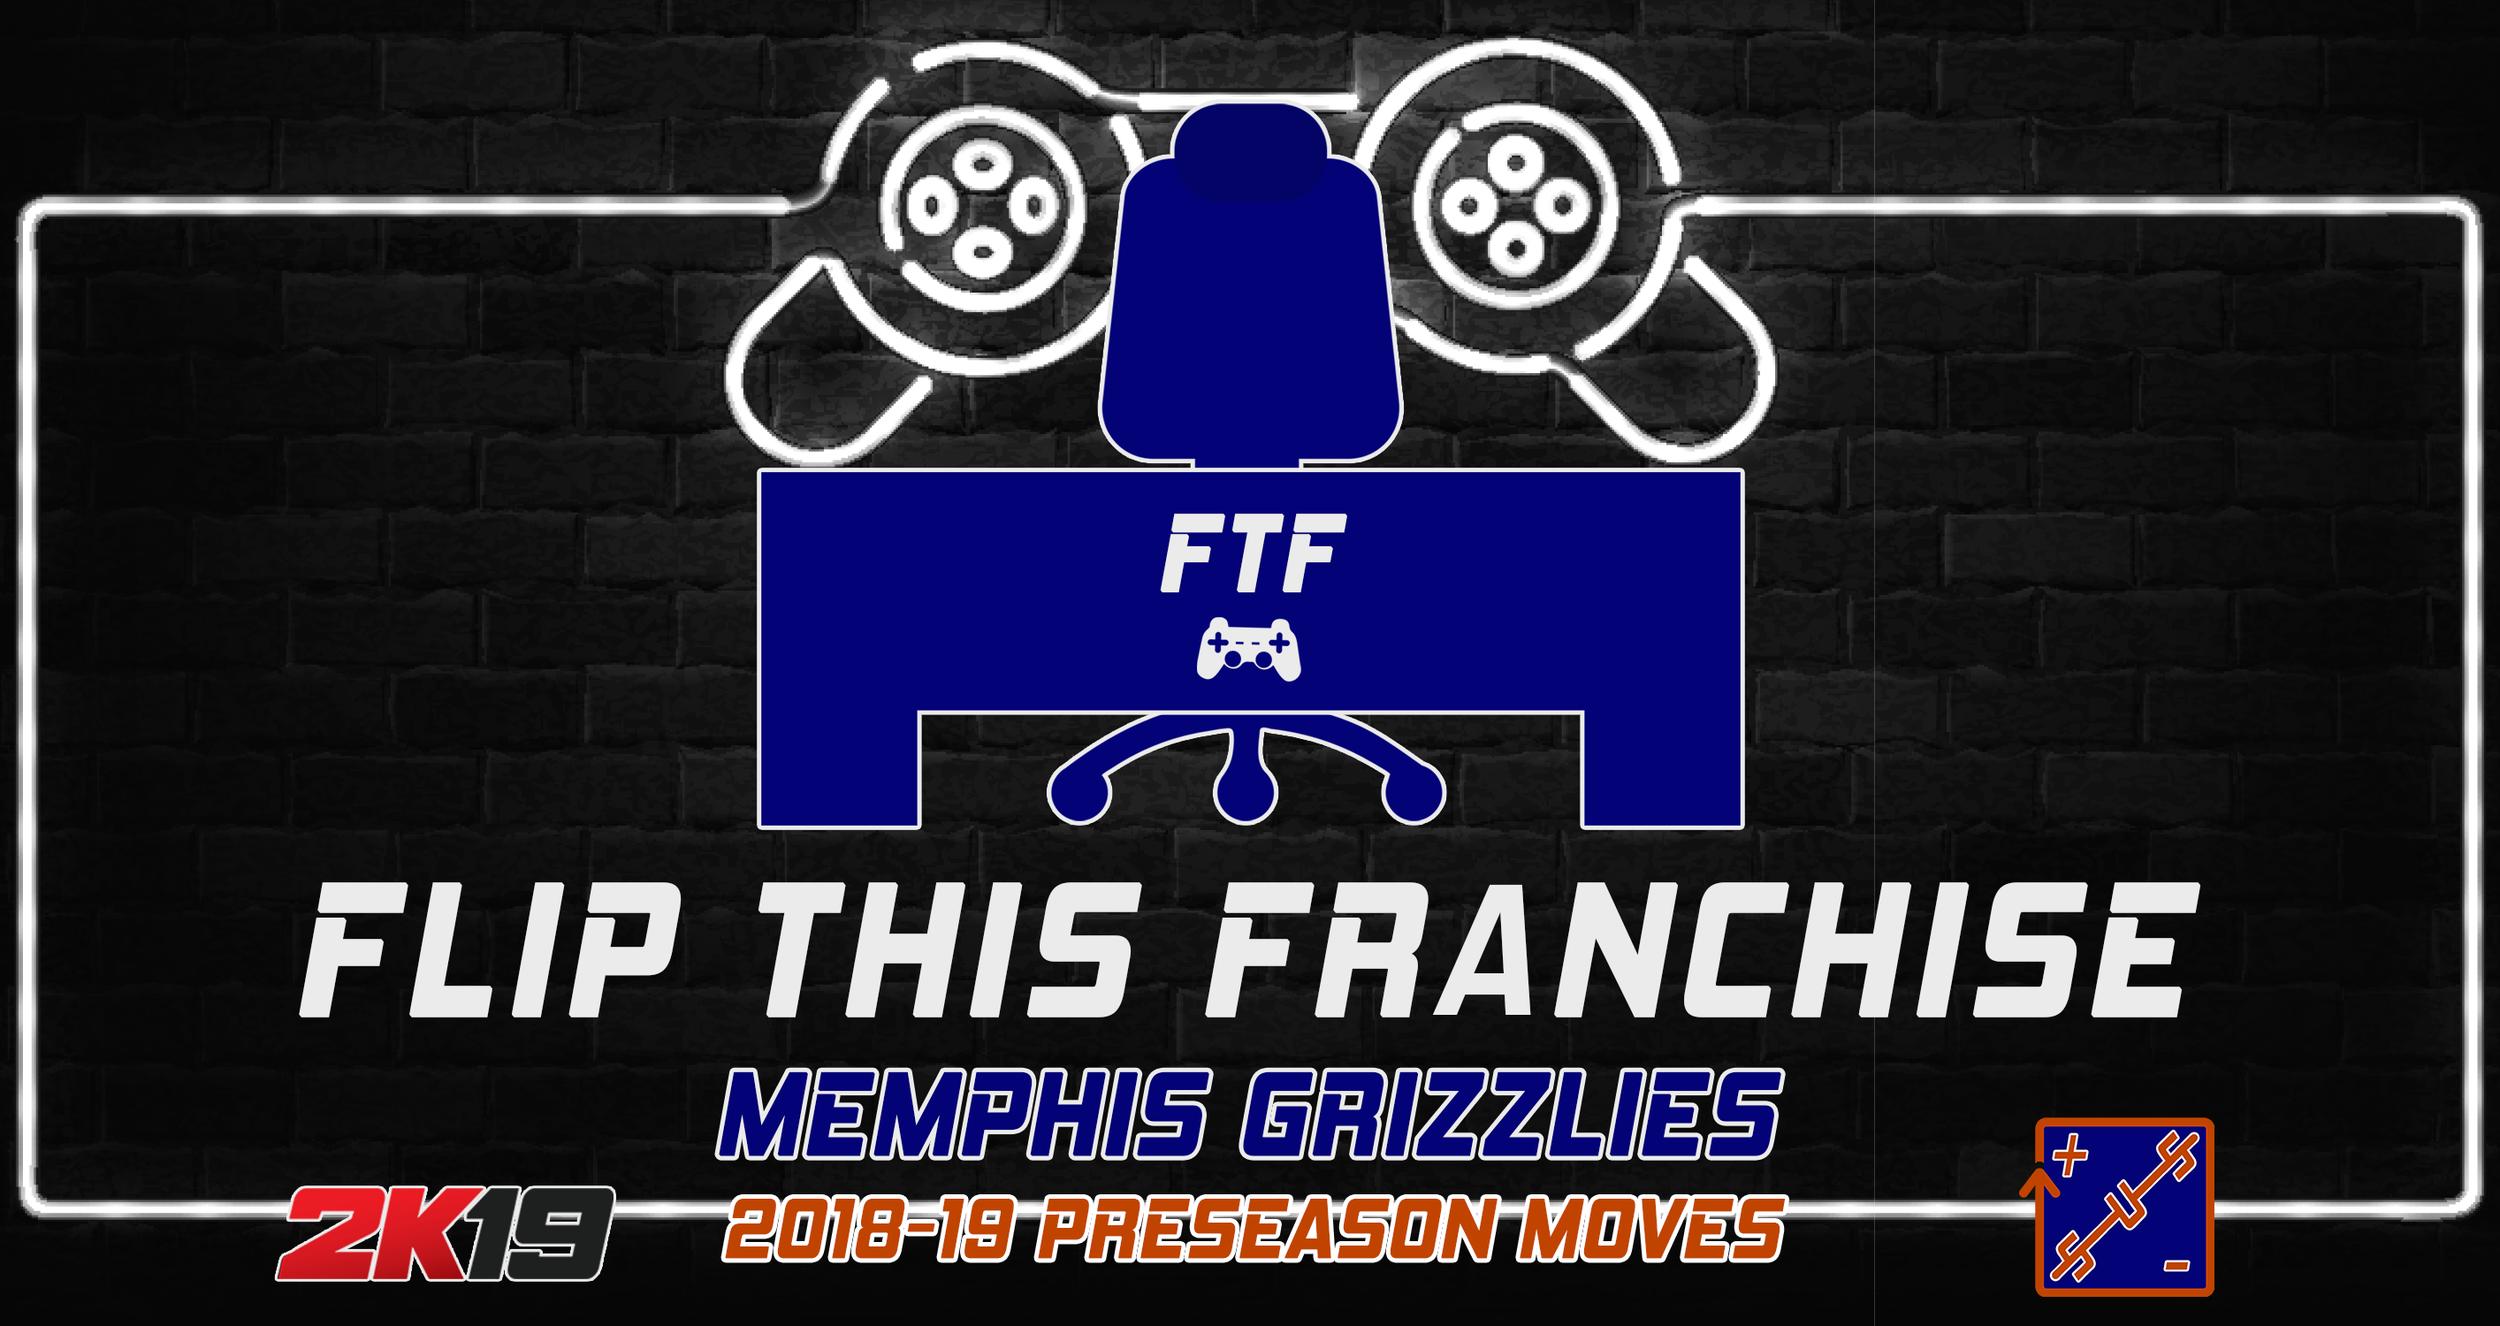 FTF Memphis Grizzlies - 2018-19 Preseason Moves — Straight